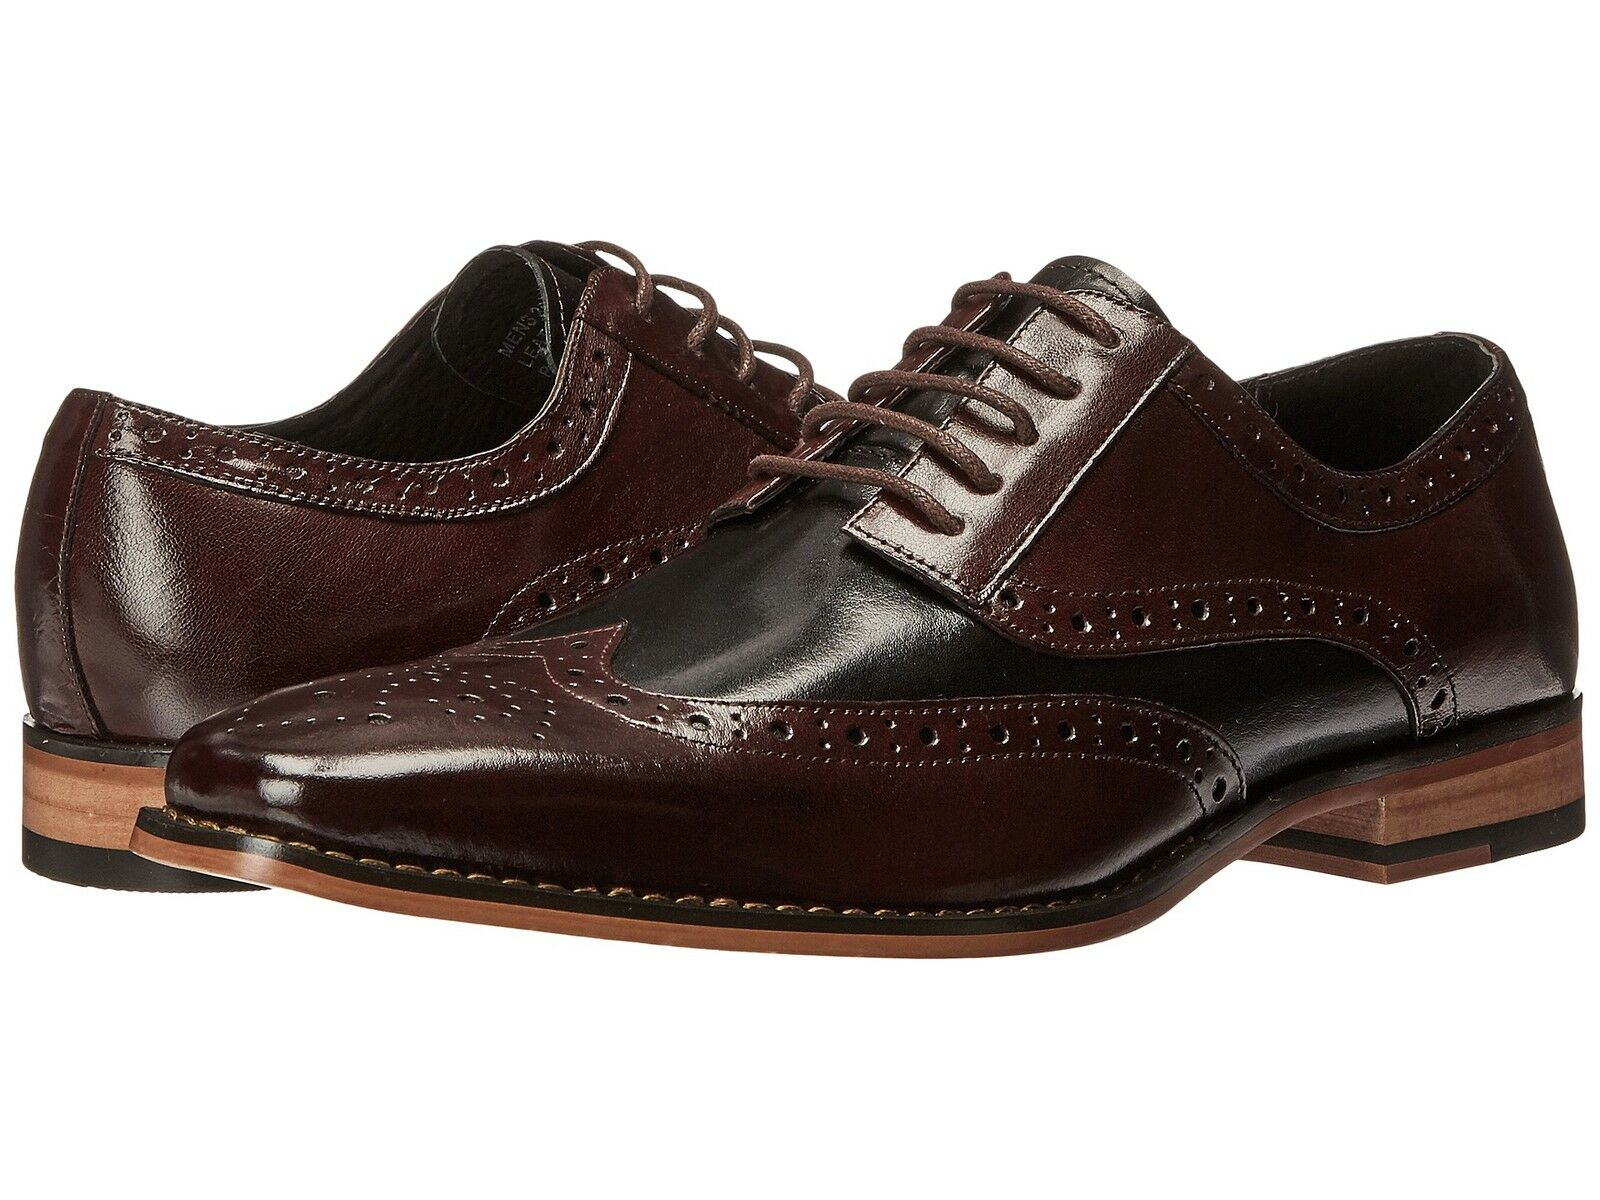 Stacy-Adams Para Hombre Tinsley punta del ala Oxford Cuero Zapatos de múltiples Borgoña 25092-641